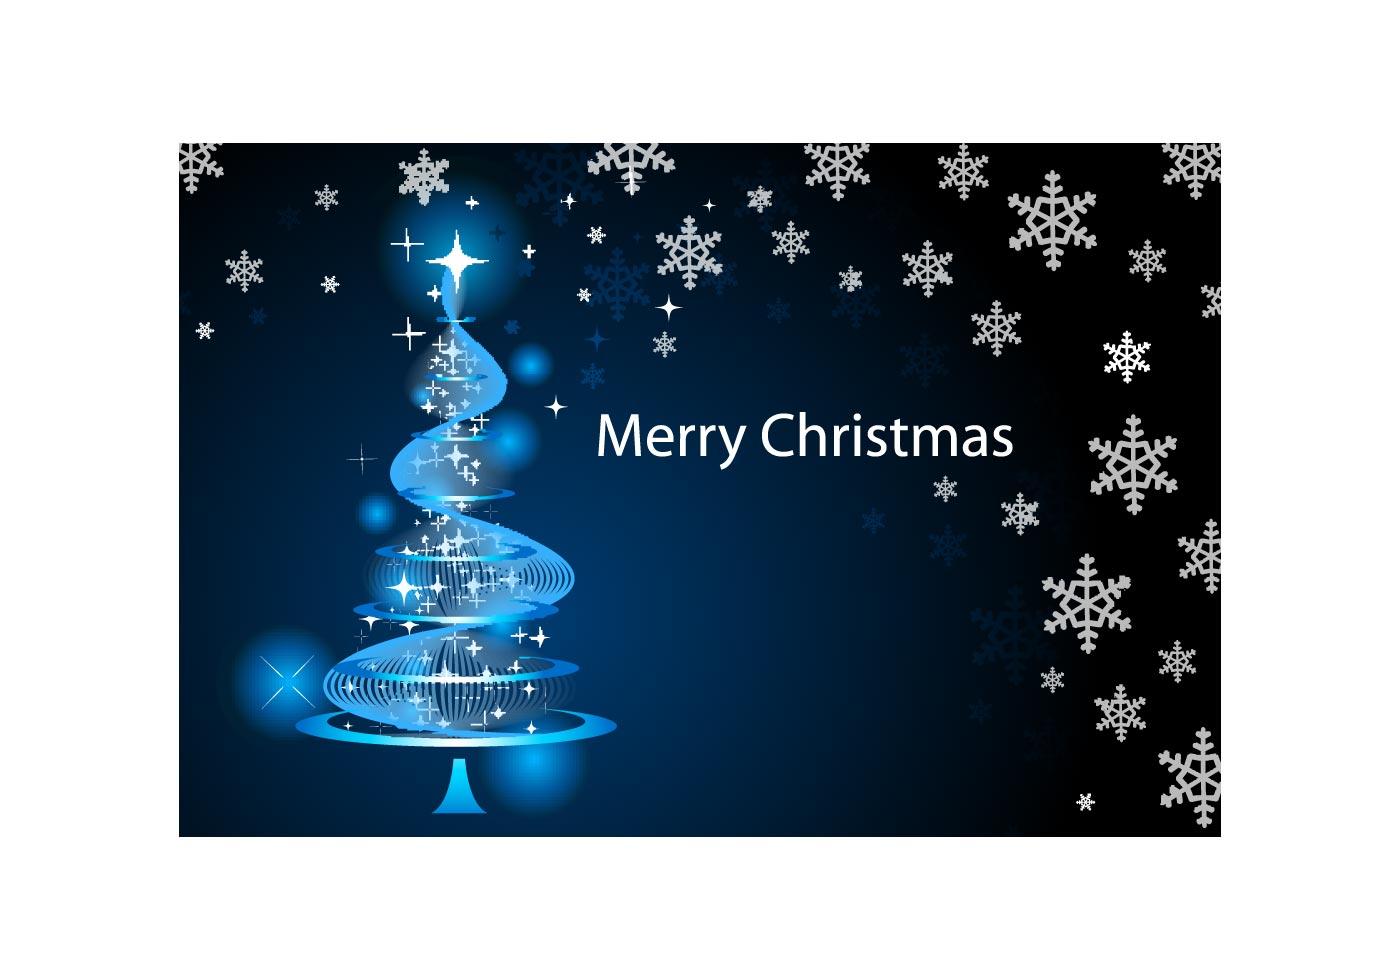 Merry Christmas Wallpaper Download Free Vector Art